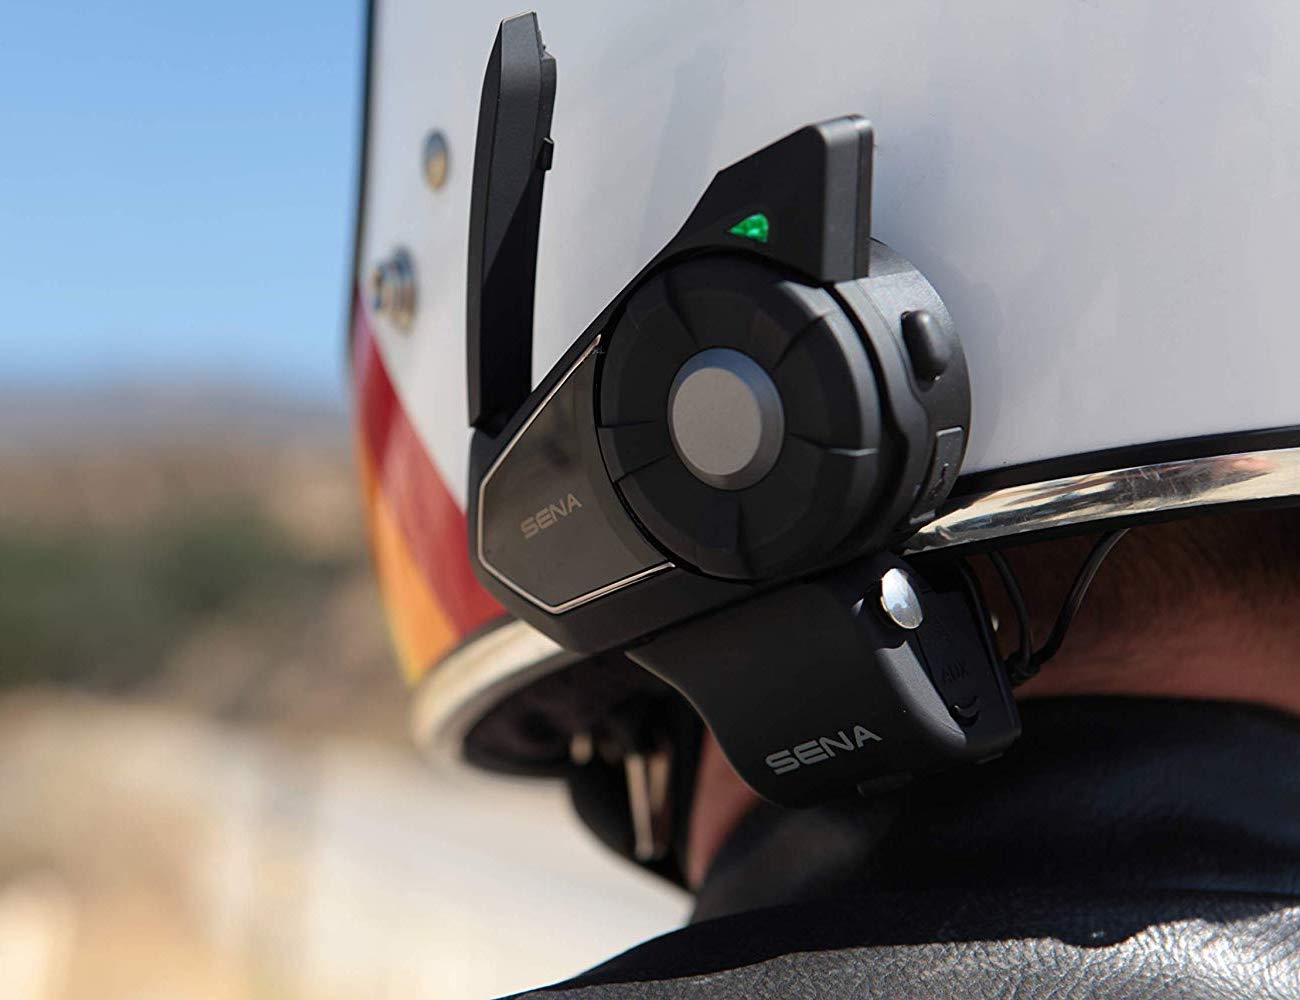 Sena 30K Motorcycle Bluetooth Communication System